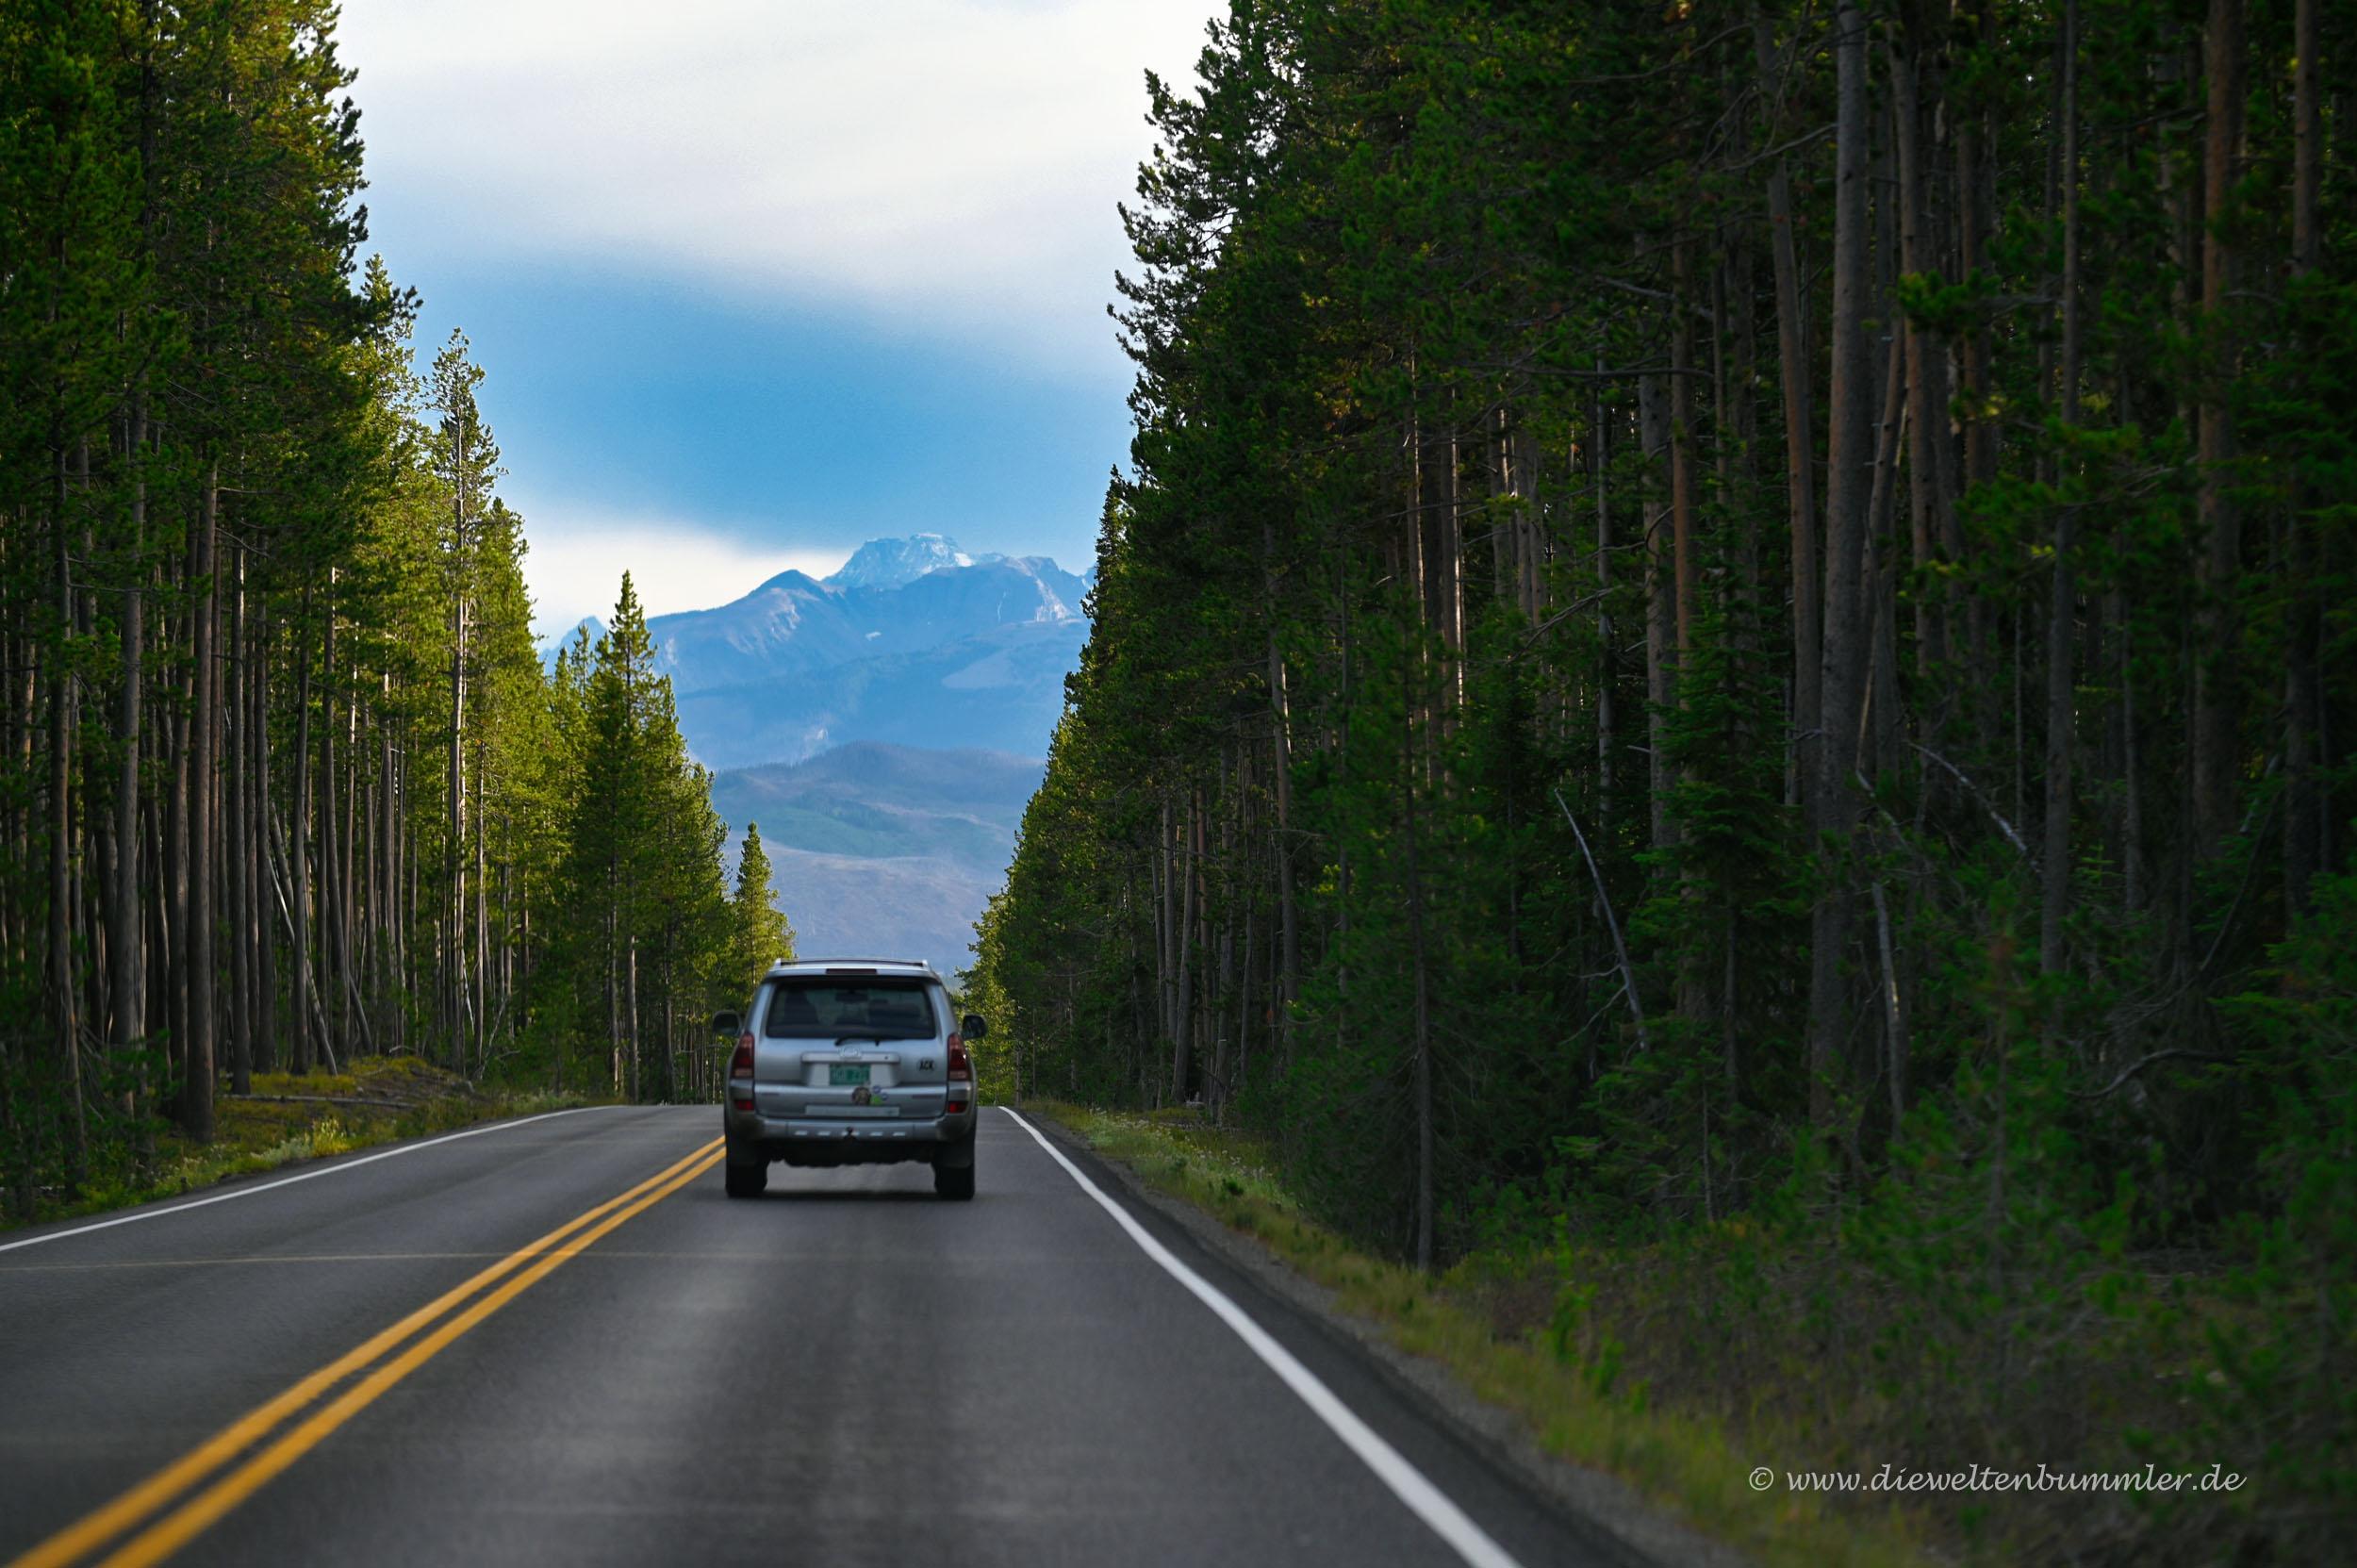 Auf dem Weg zum Grand Teton